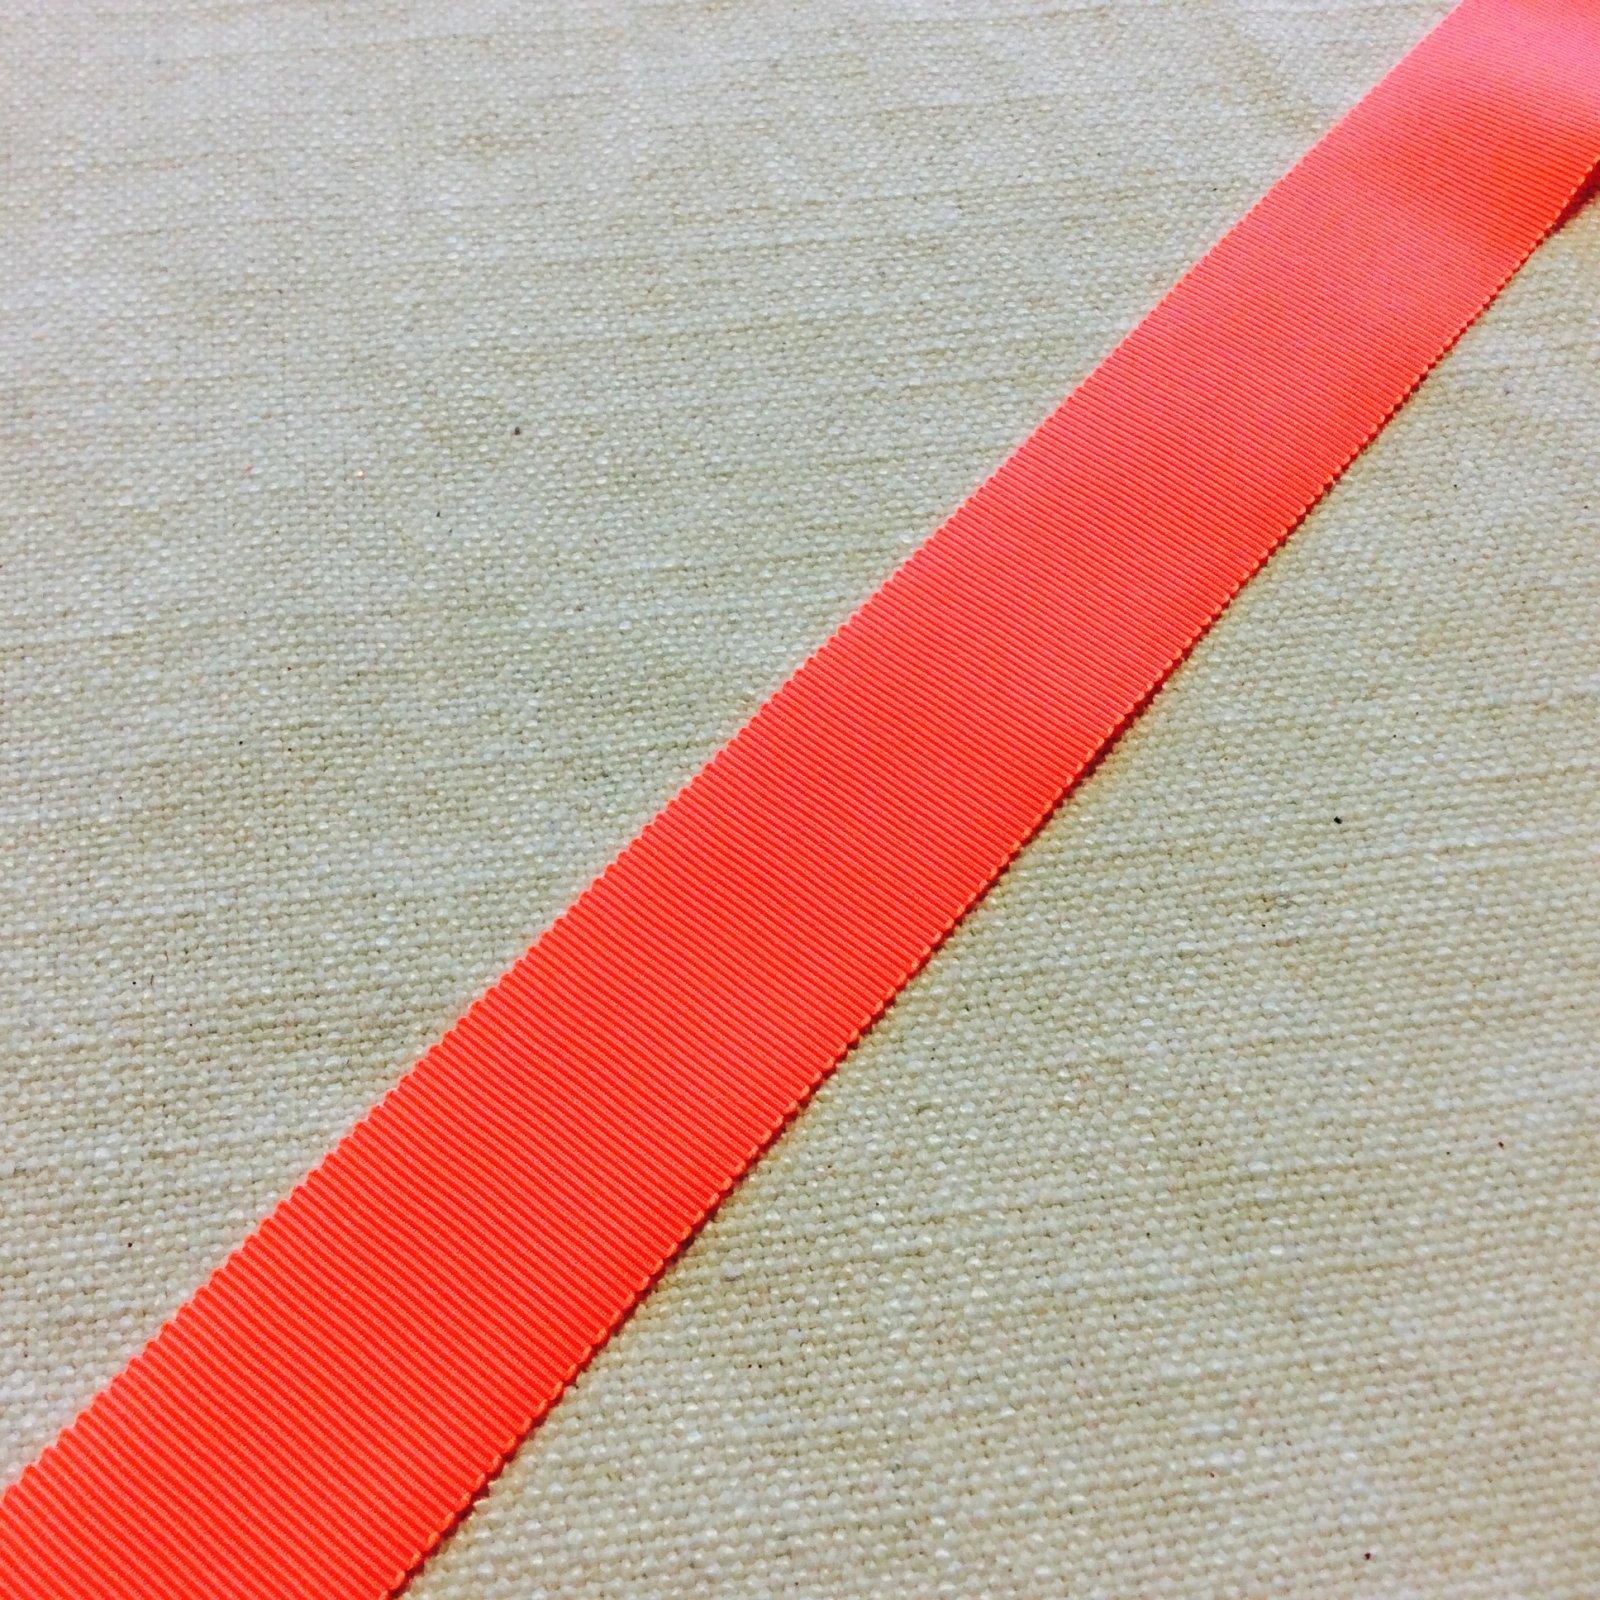 Grosgrain Ribbon 1.25 High End Japanese Woven Fluorescent Orange Trim Ribbon RIB1174